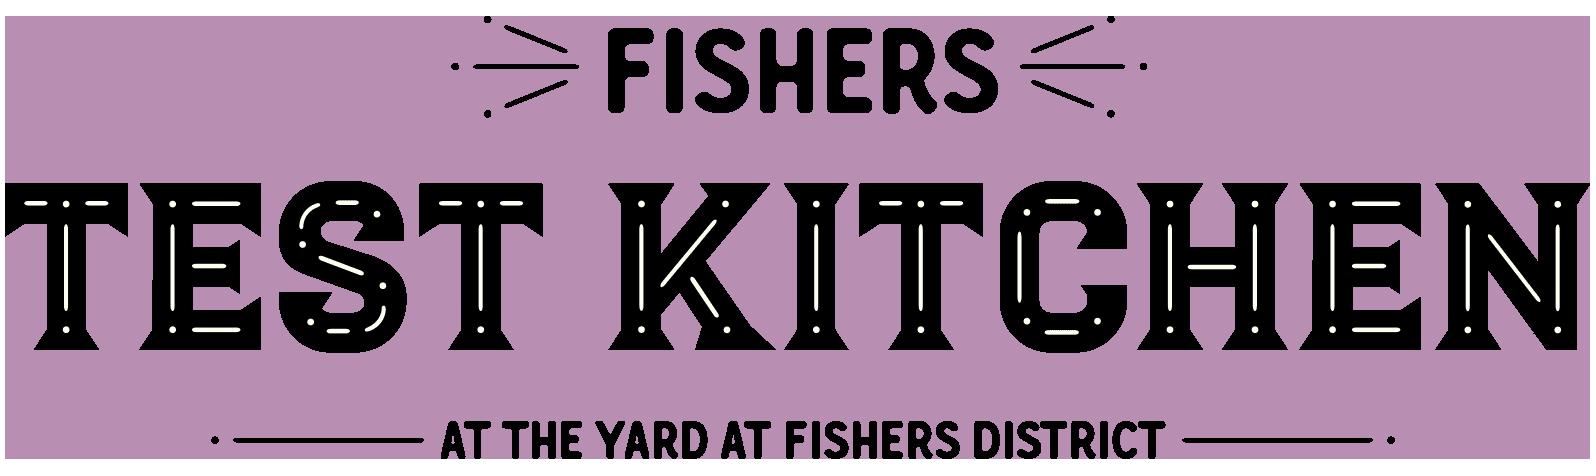 Fishers-Test-Kitchen-Logo_black.png